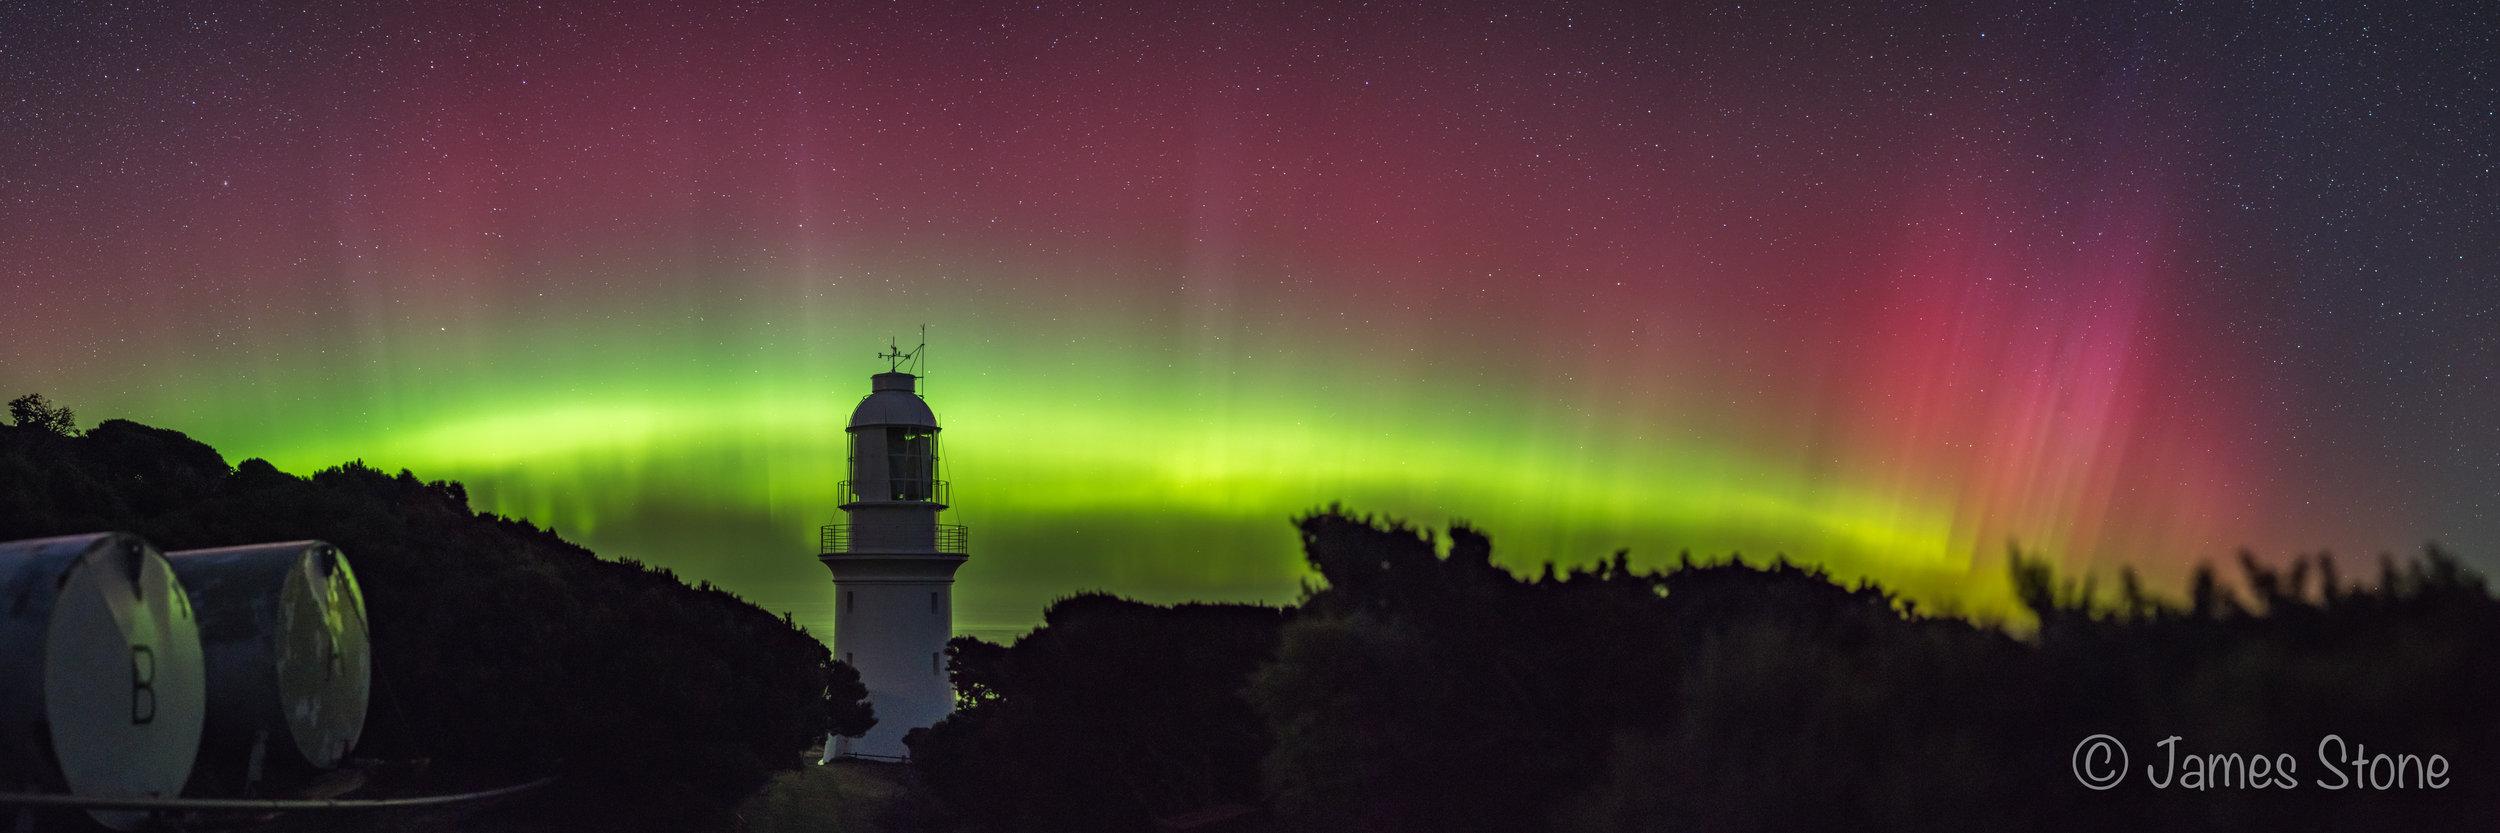 Light of the aurora